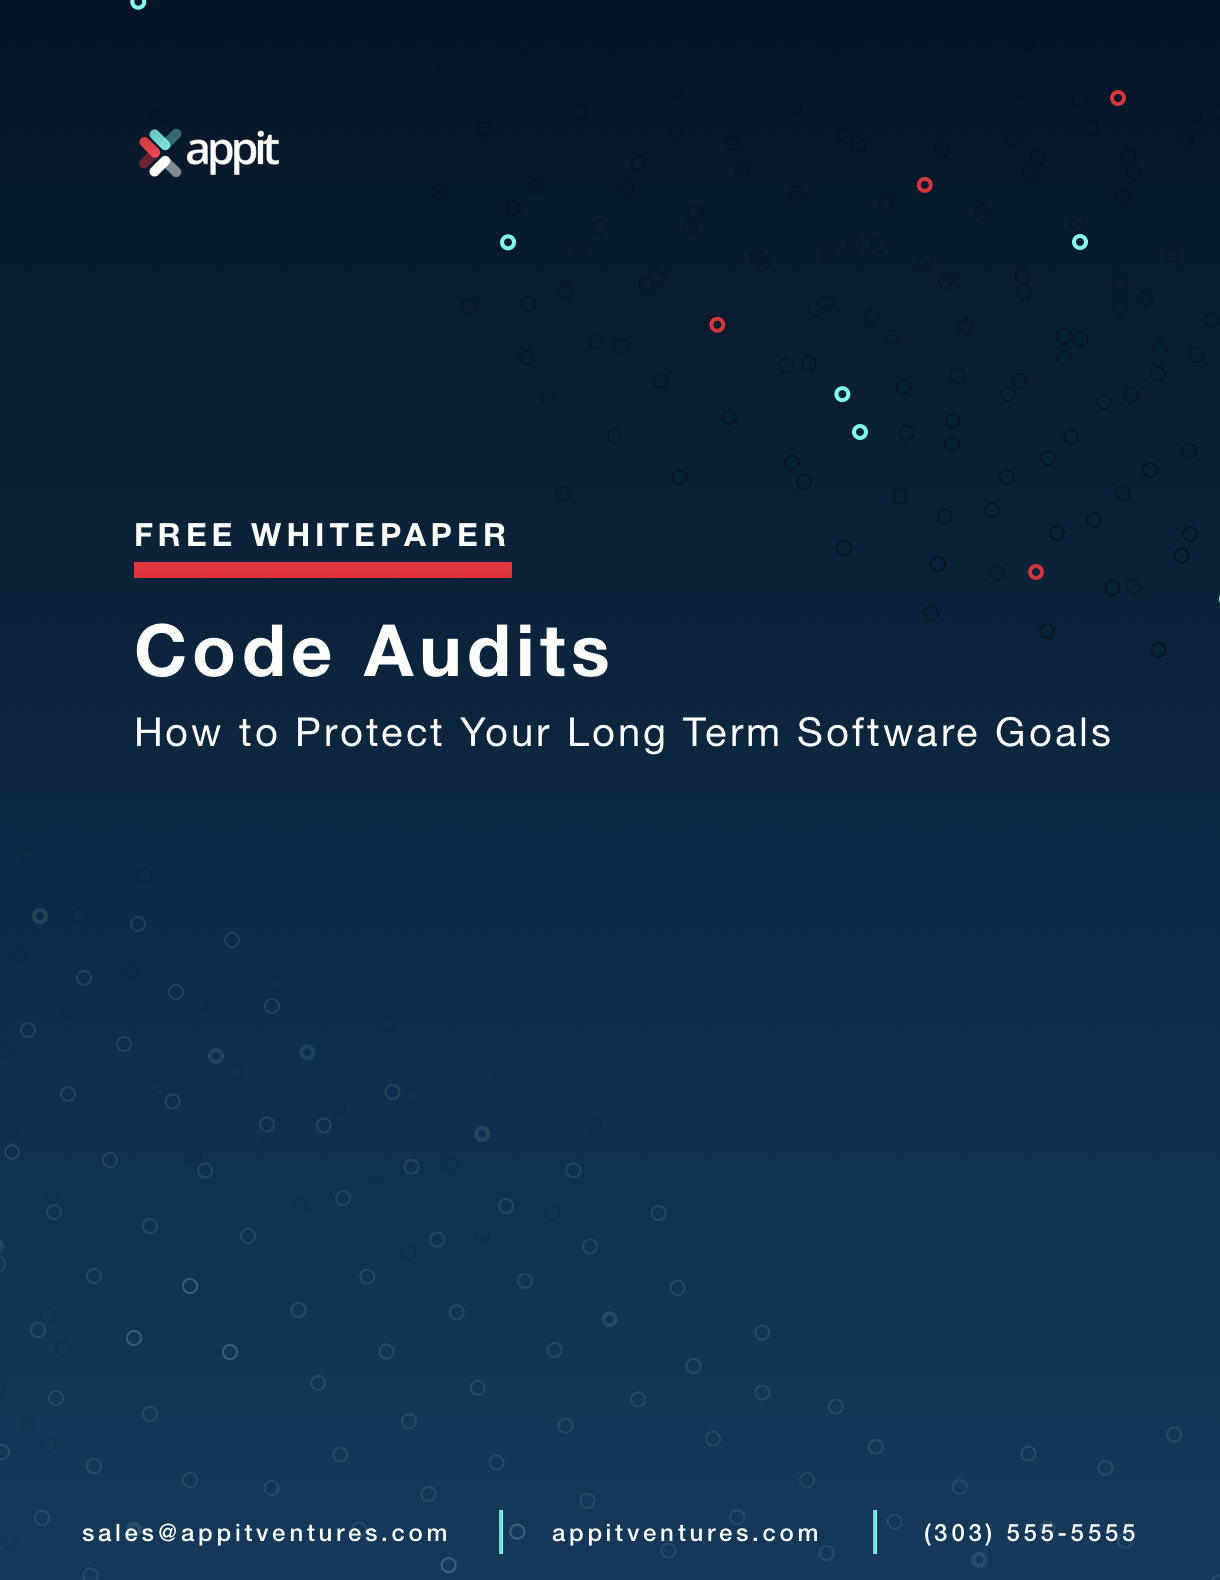 Code Audit Whitepaper Cover Image